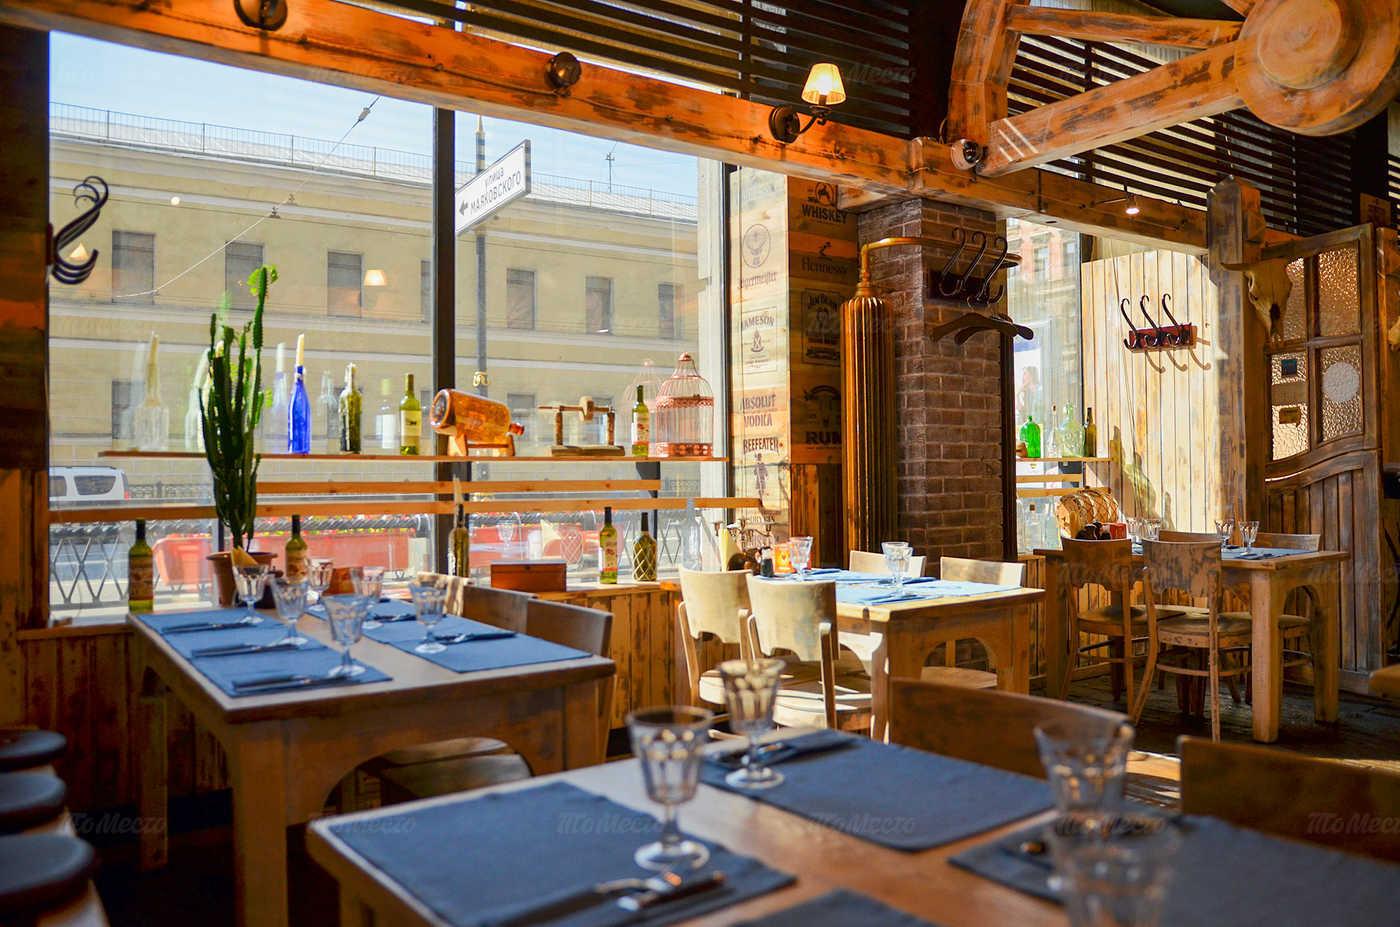 Ресторан Монтана (Montana saloon) на Кирочной улице фото 2